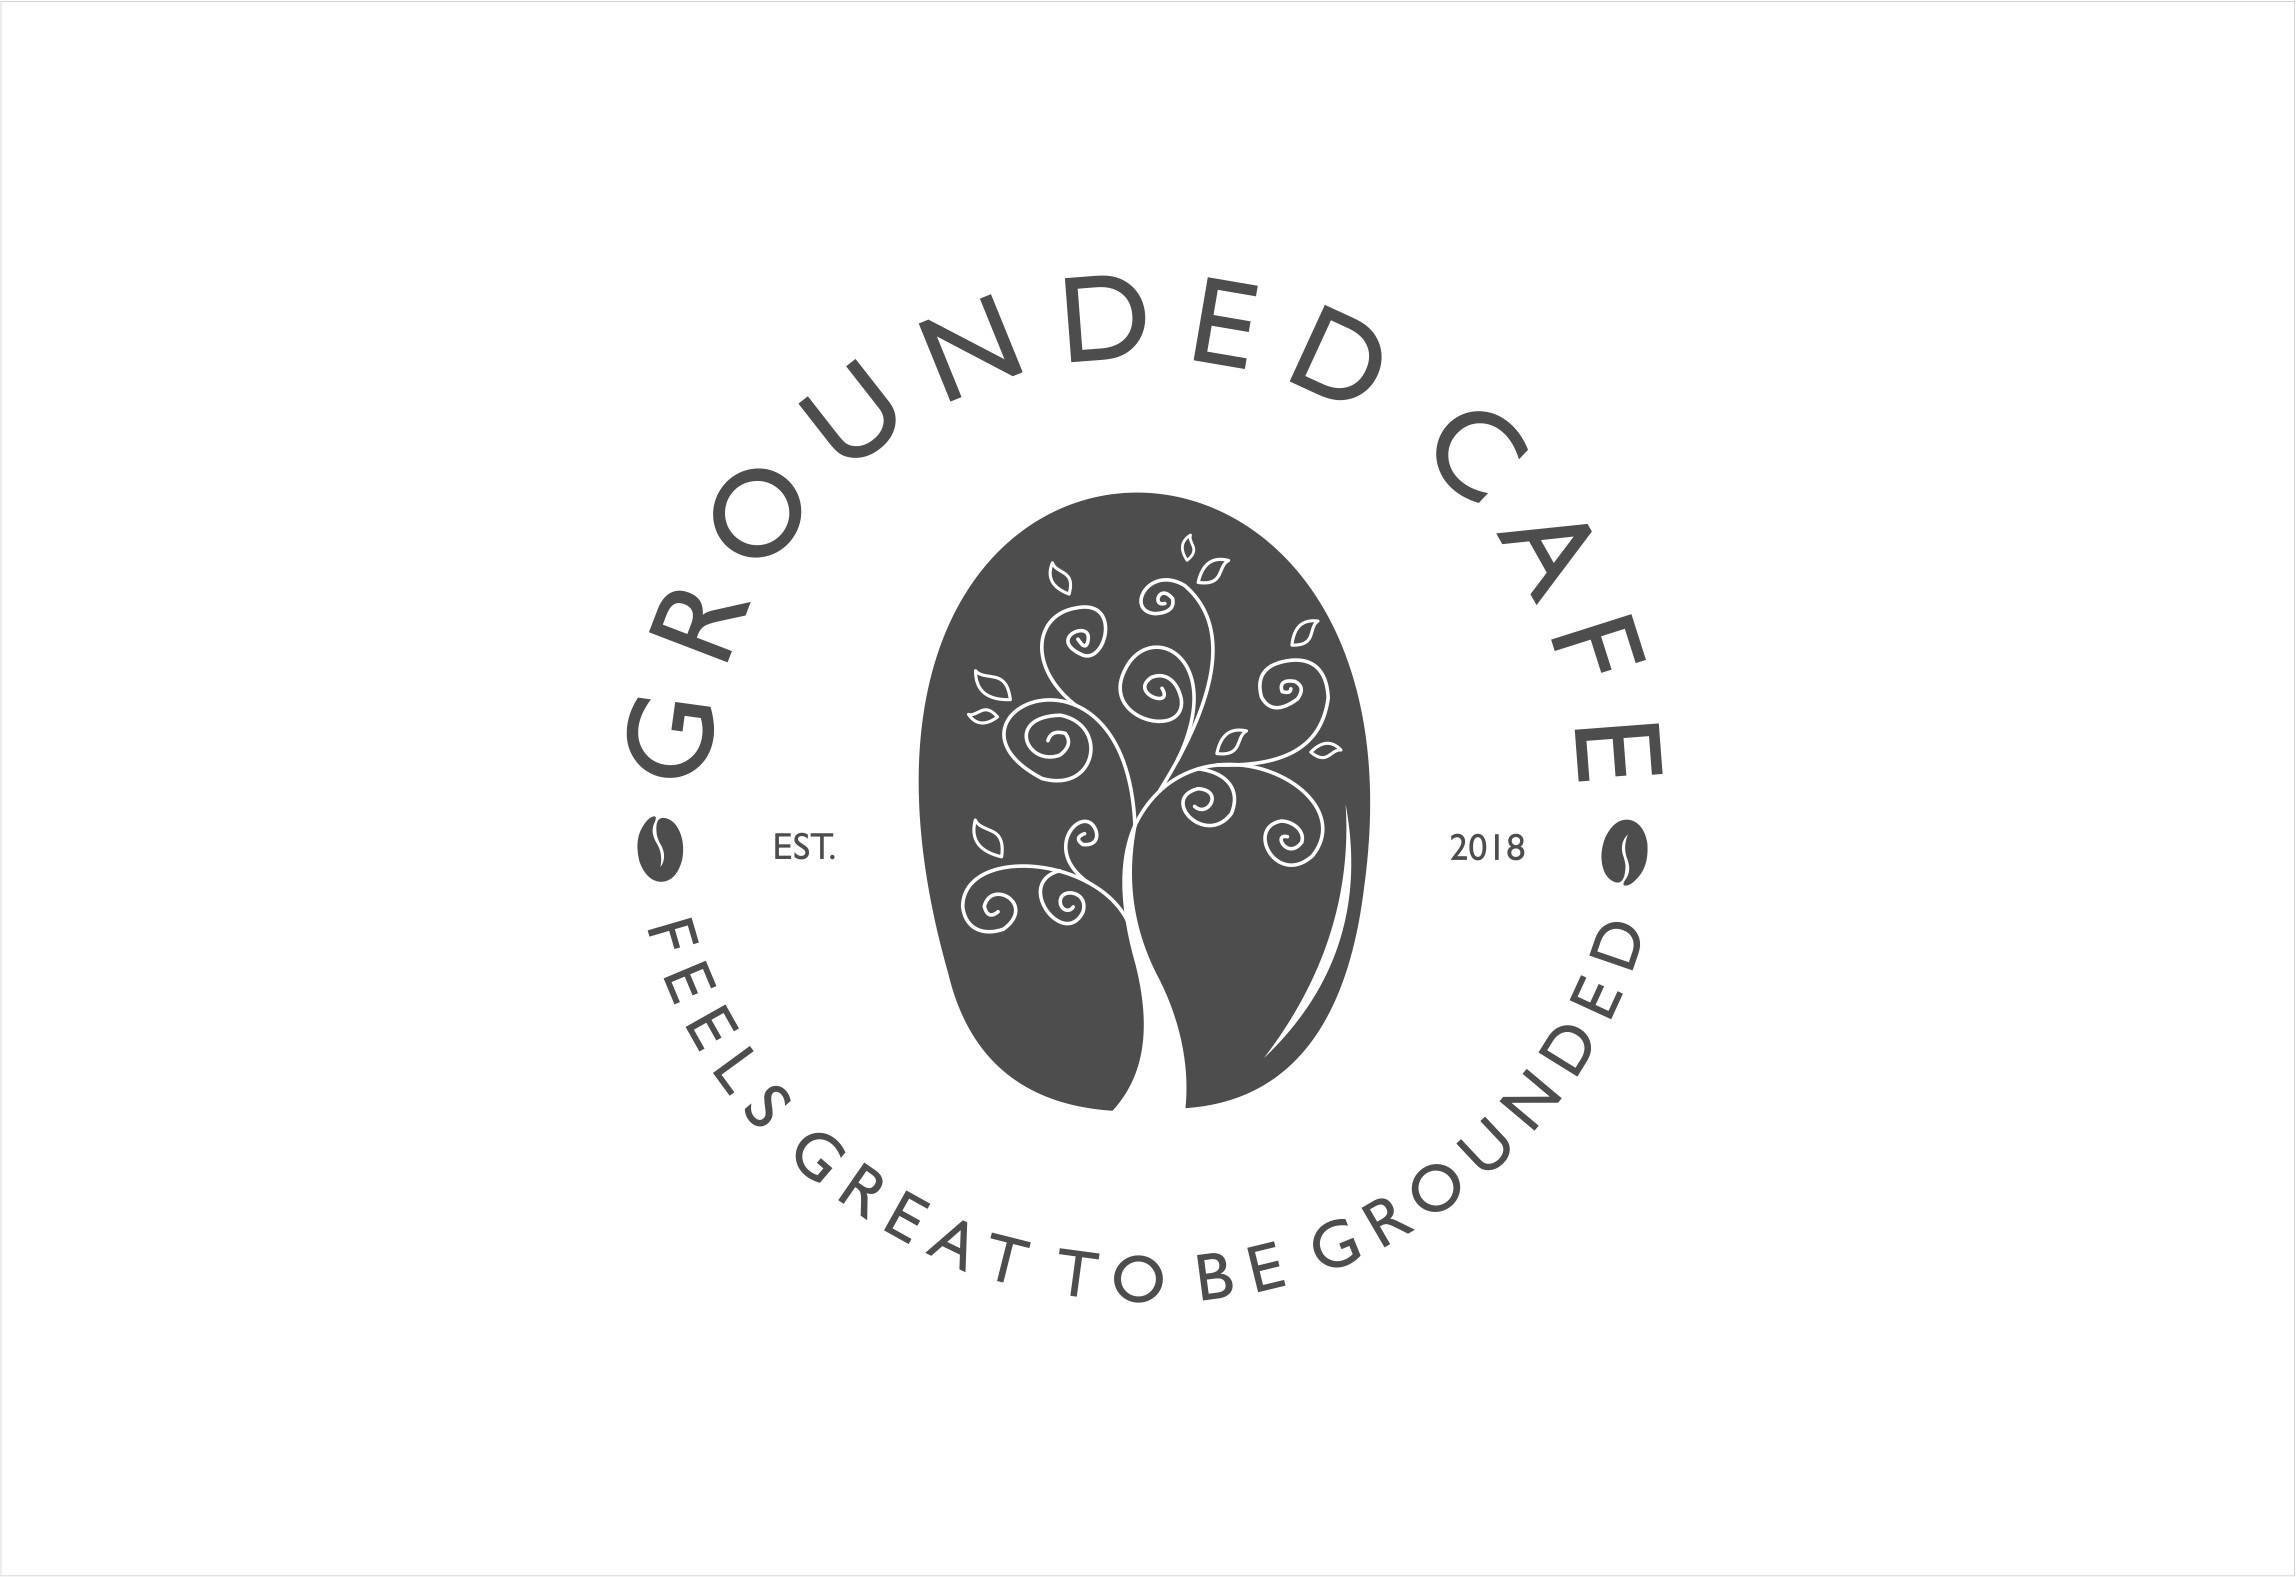 New Coffee Shop/Cafe needing a fun logo!